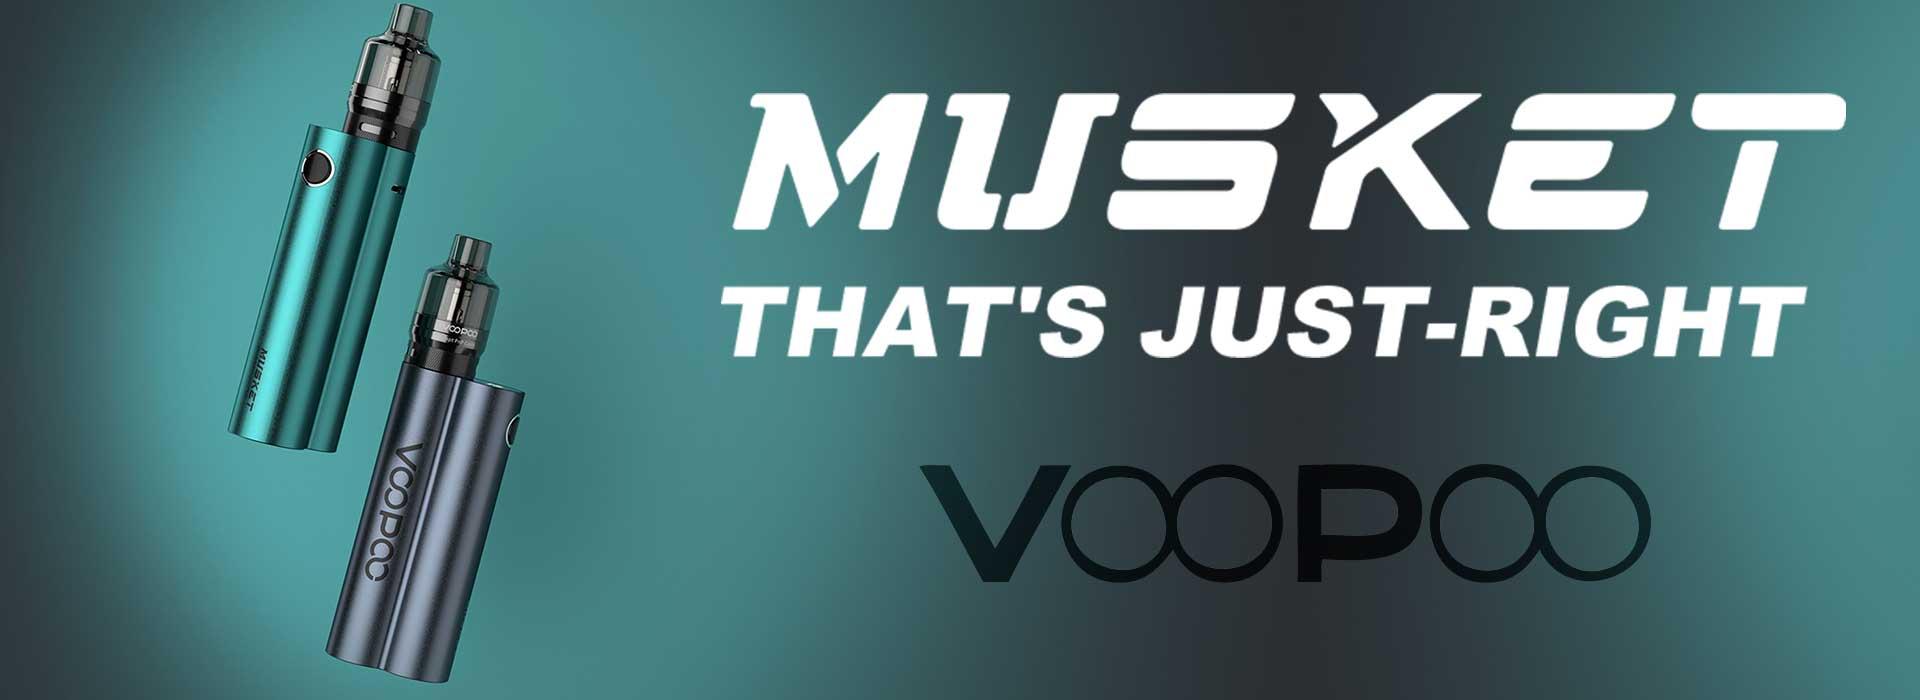 Voopoo Musket